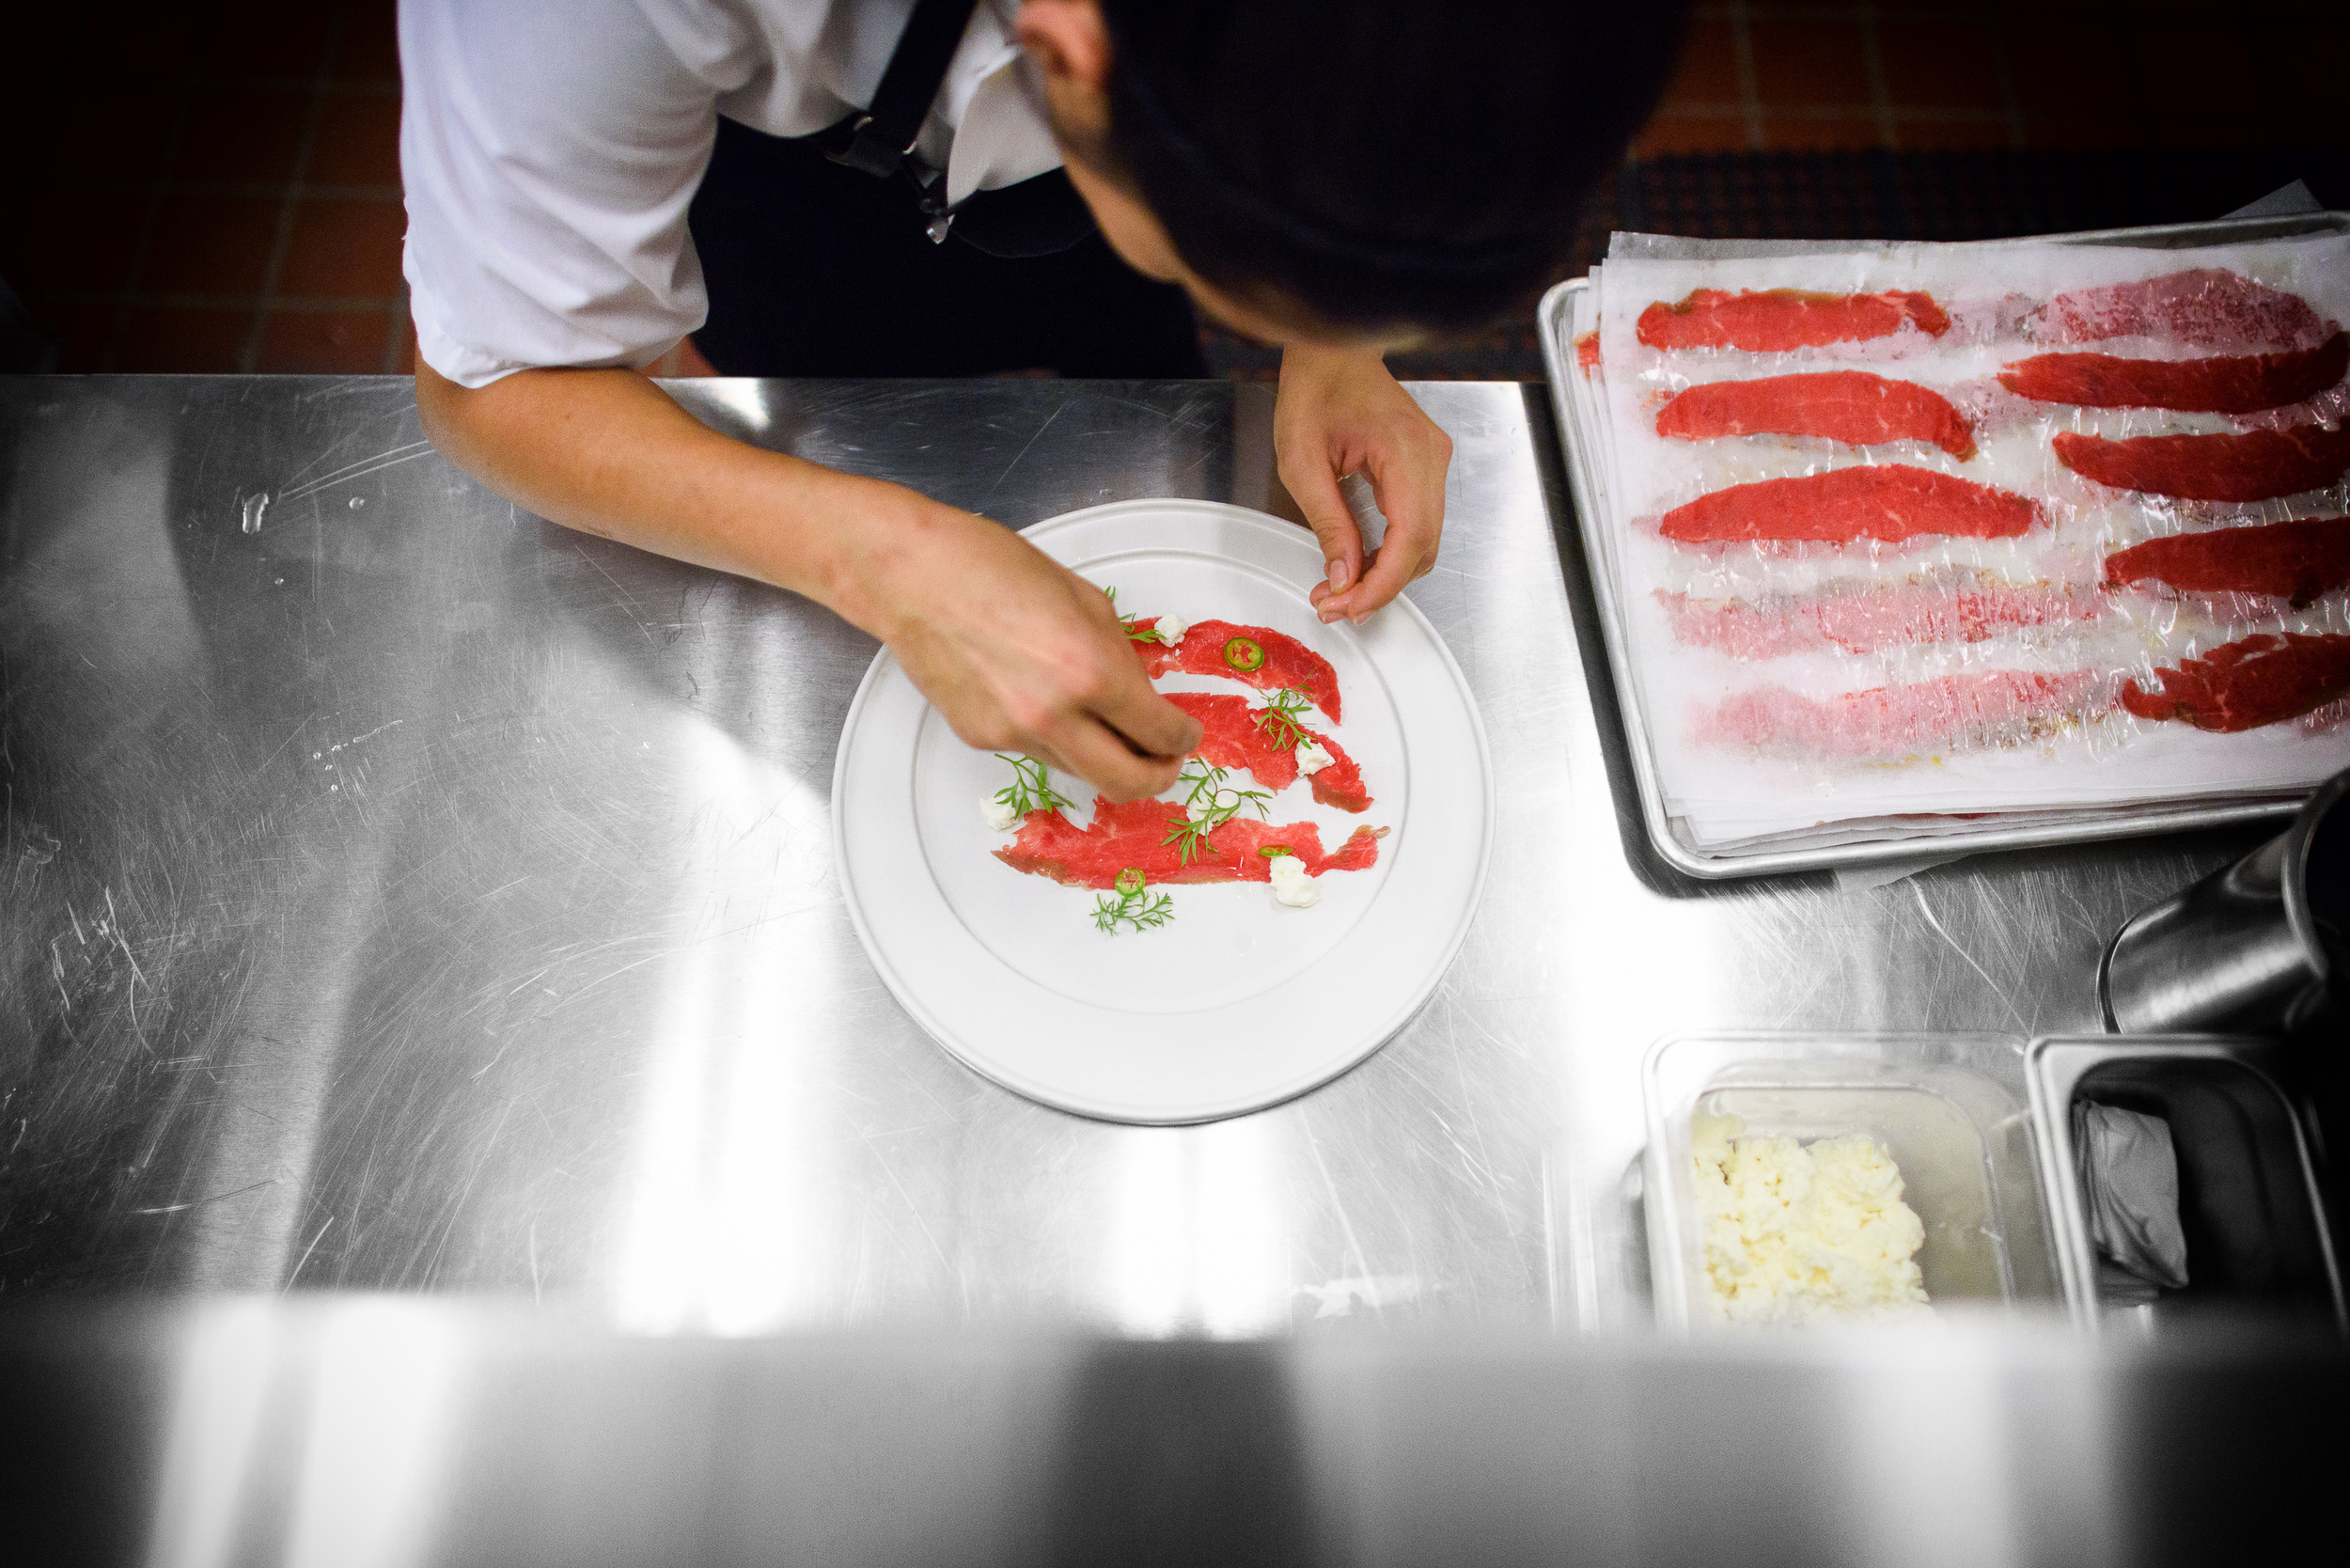 Chef Daniela Soto-Innes plating beef skirt carpaccio